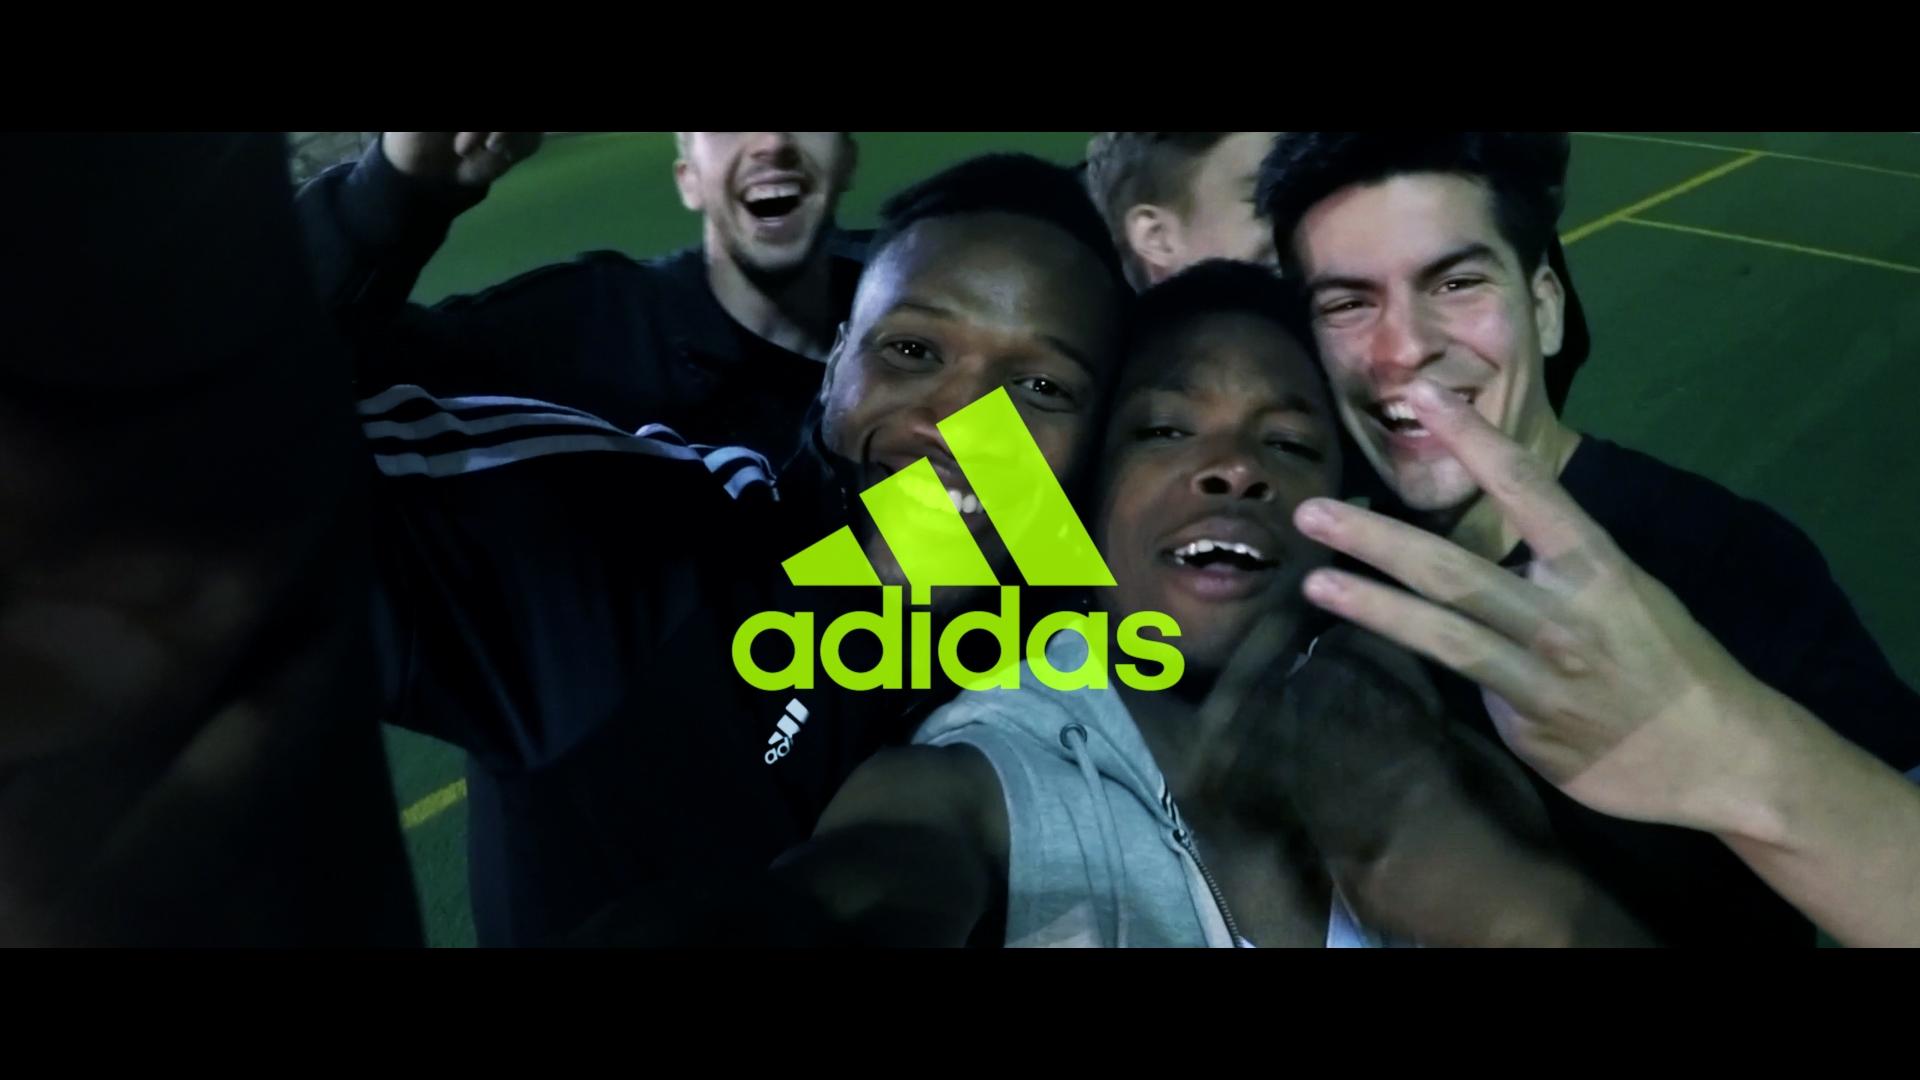 adidas unfollow Lionel Messi